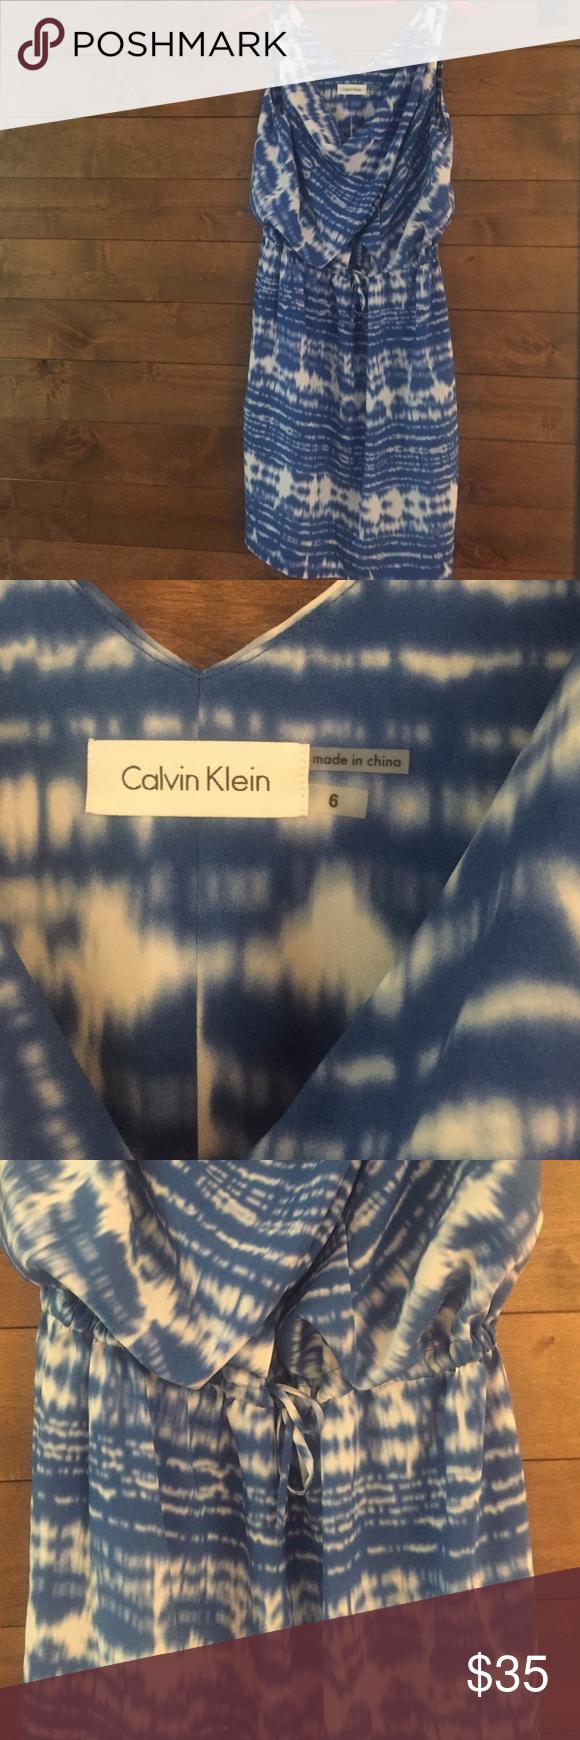 Calvin Klein NWOT chiffon dress Perfect condition, adjustable waist (tie waist) Calvin Klein Dresses